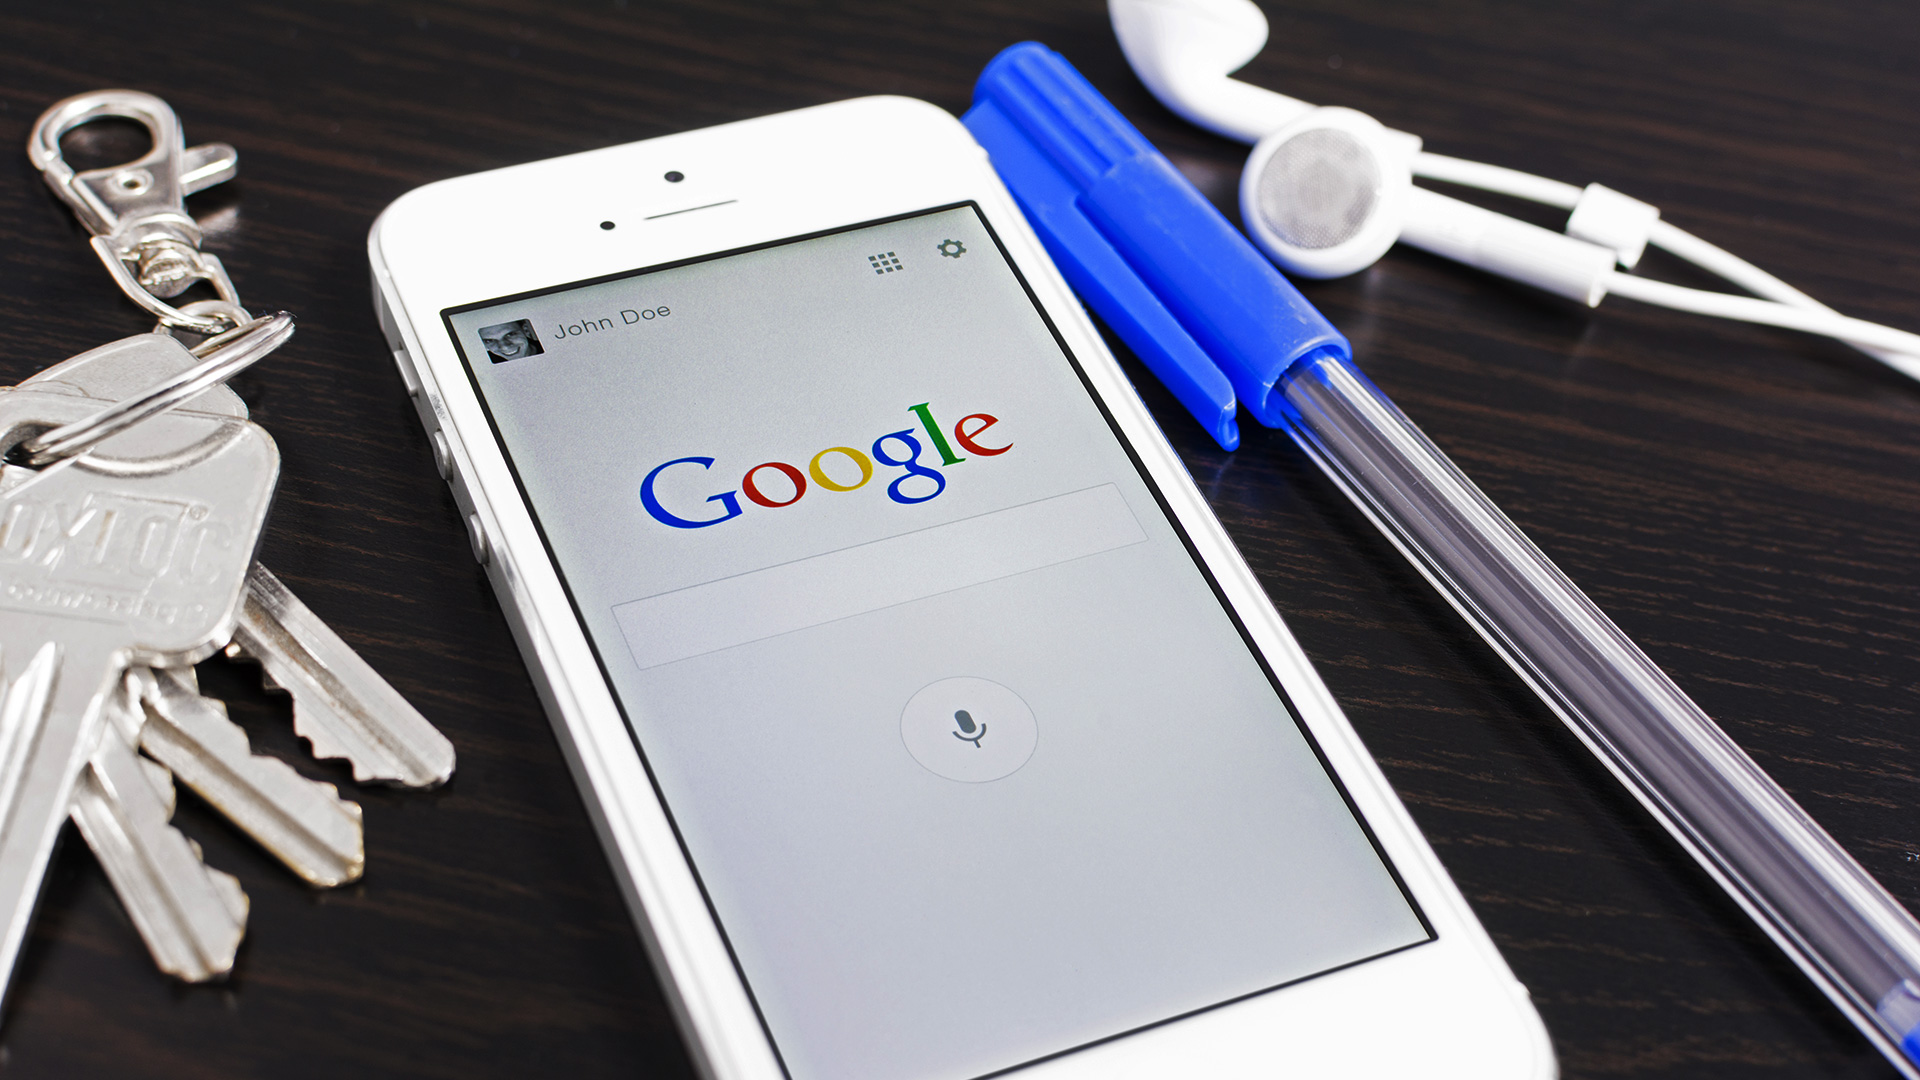 google-mobile-smartphone-search-ss-1920